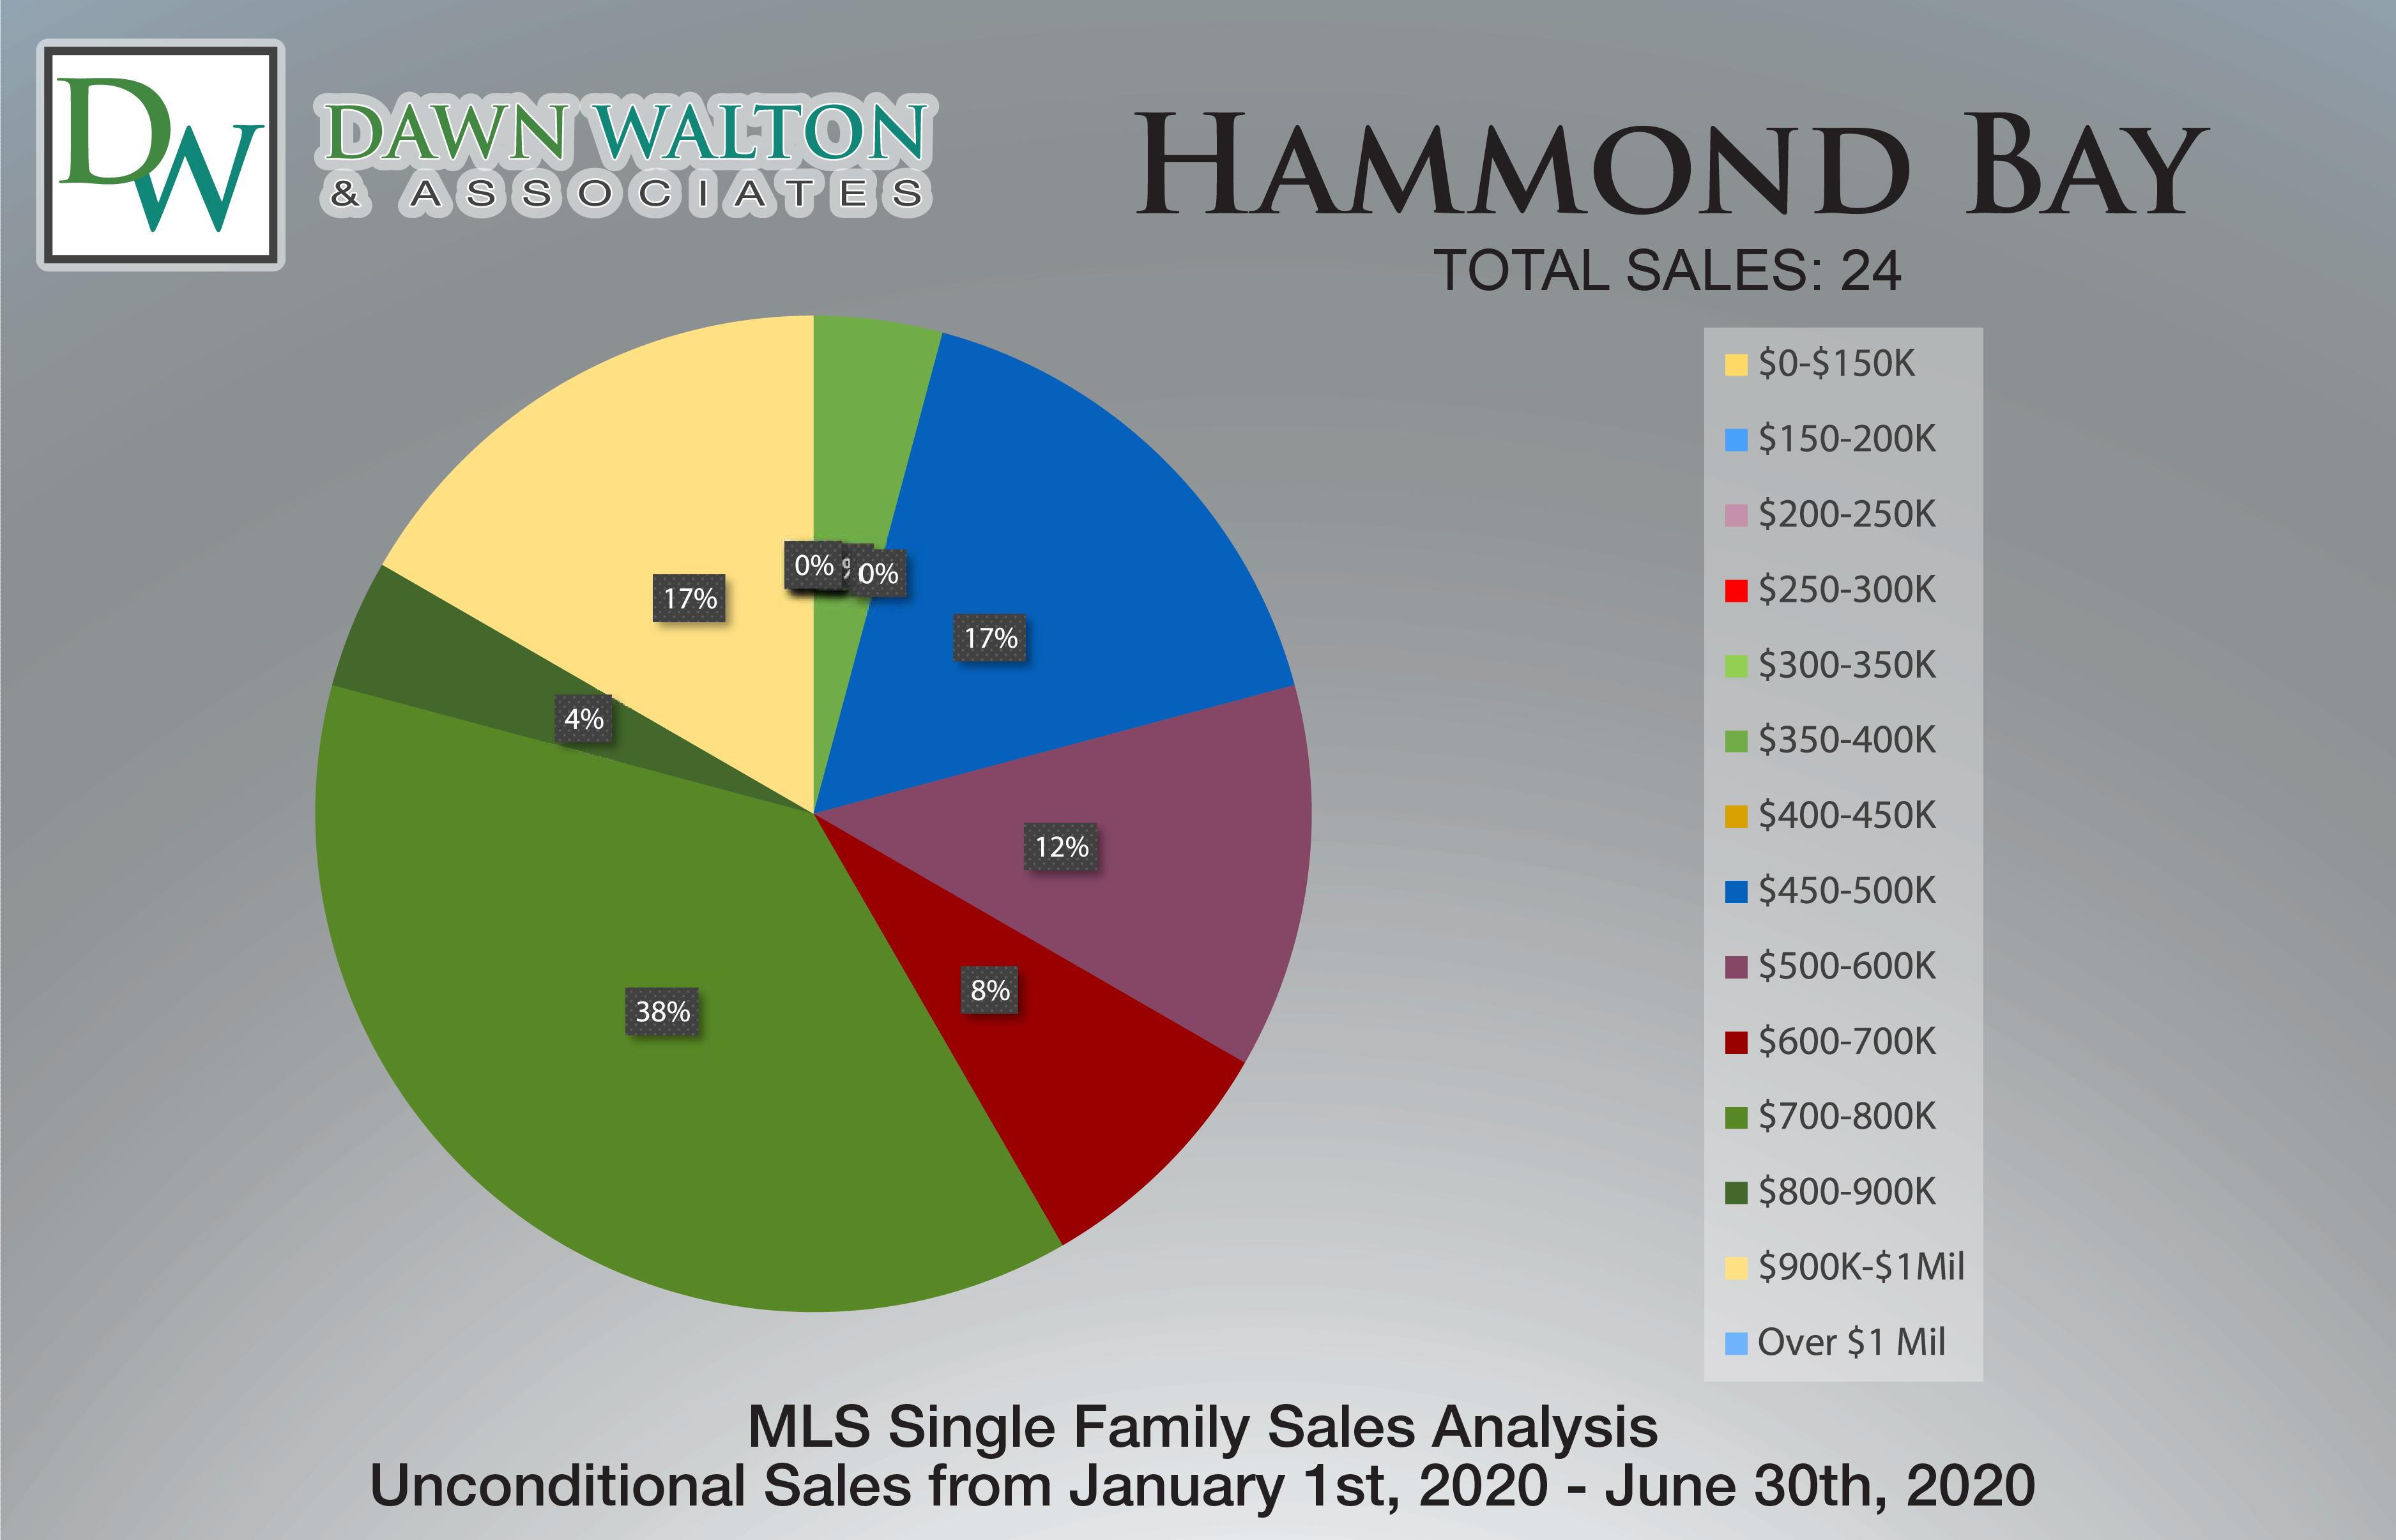 Hammond Bay Real Estate Market Stats Price Percentage Jan 1- June 30th  2020 - Nanaimo Realtor Dawn Walton